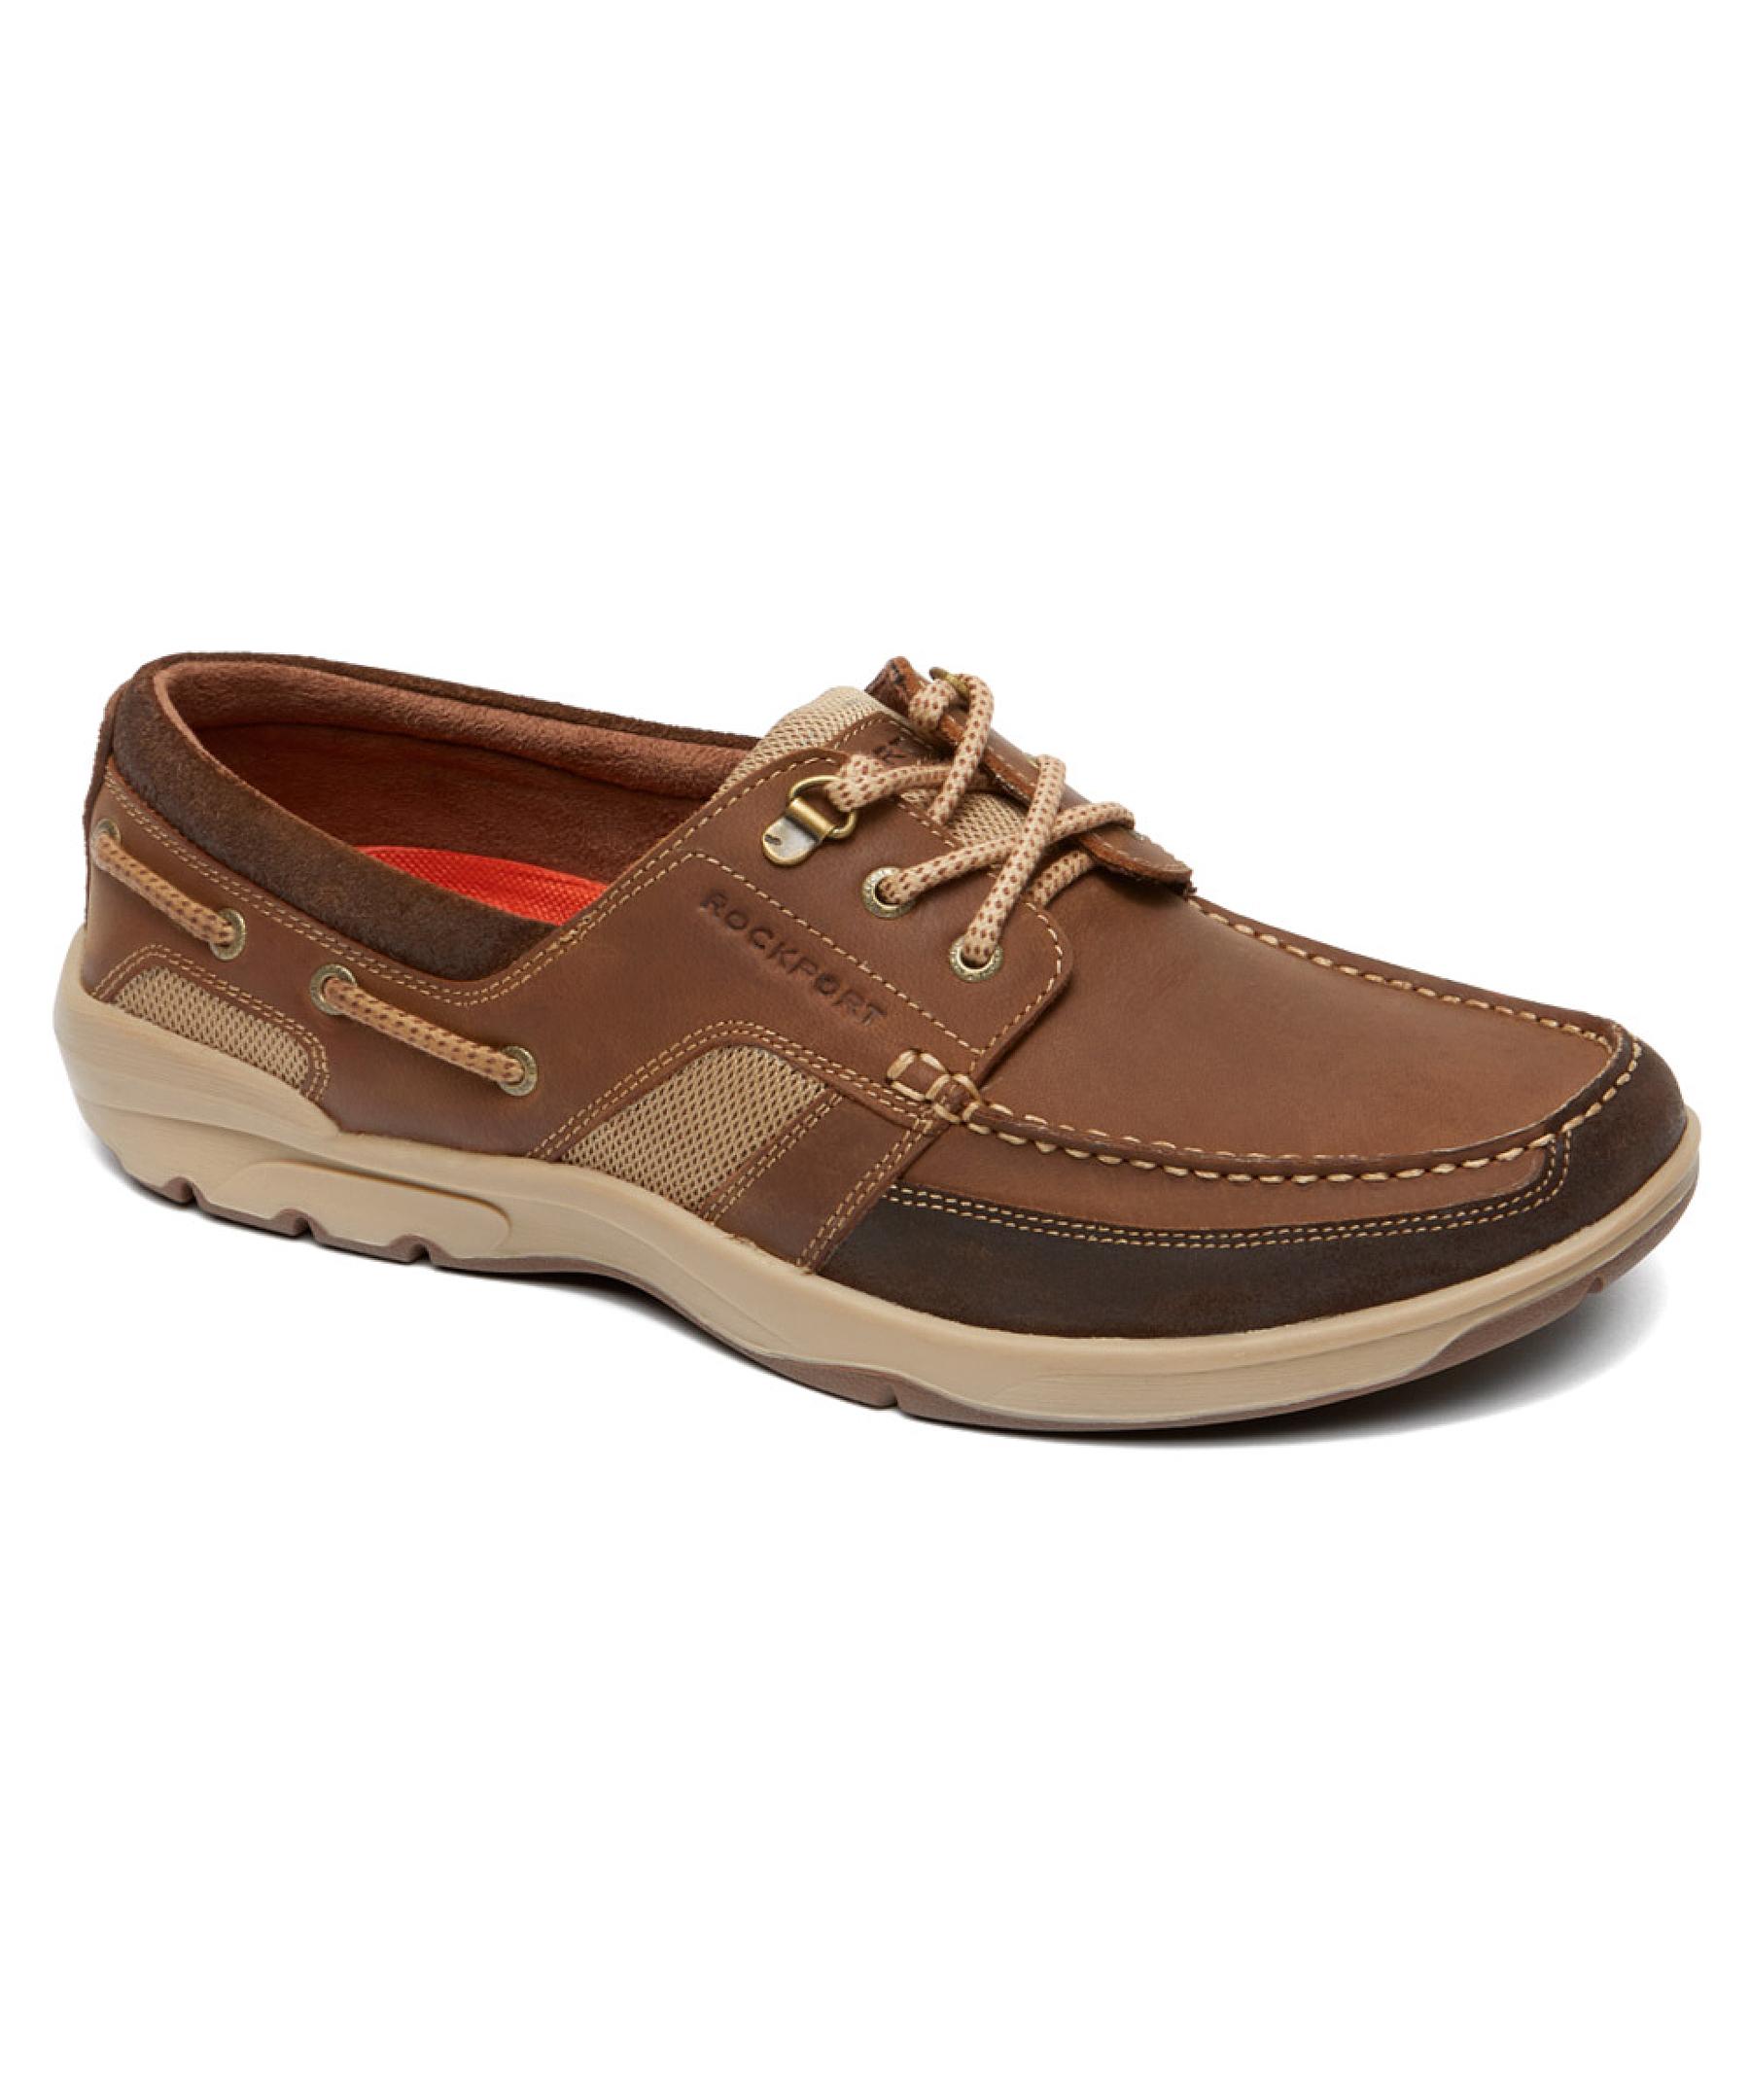 Rockport Mens Lace Up Mesh Shoes